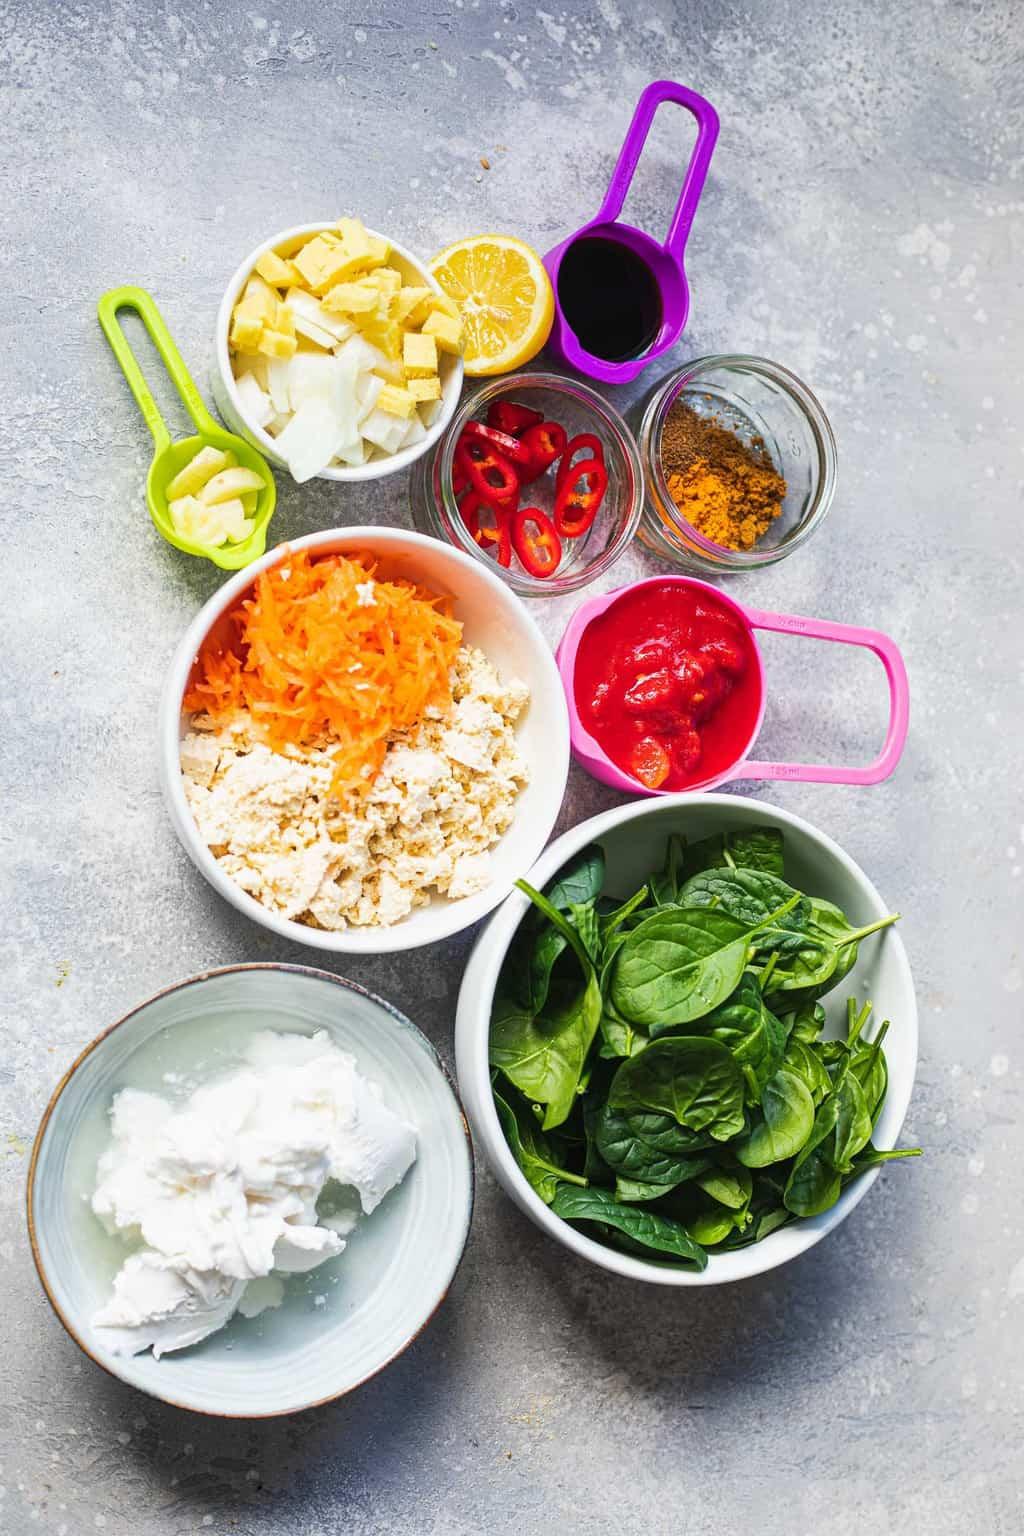 Ingredients for vegan tofu curry